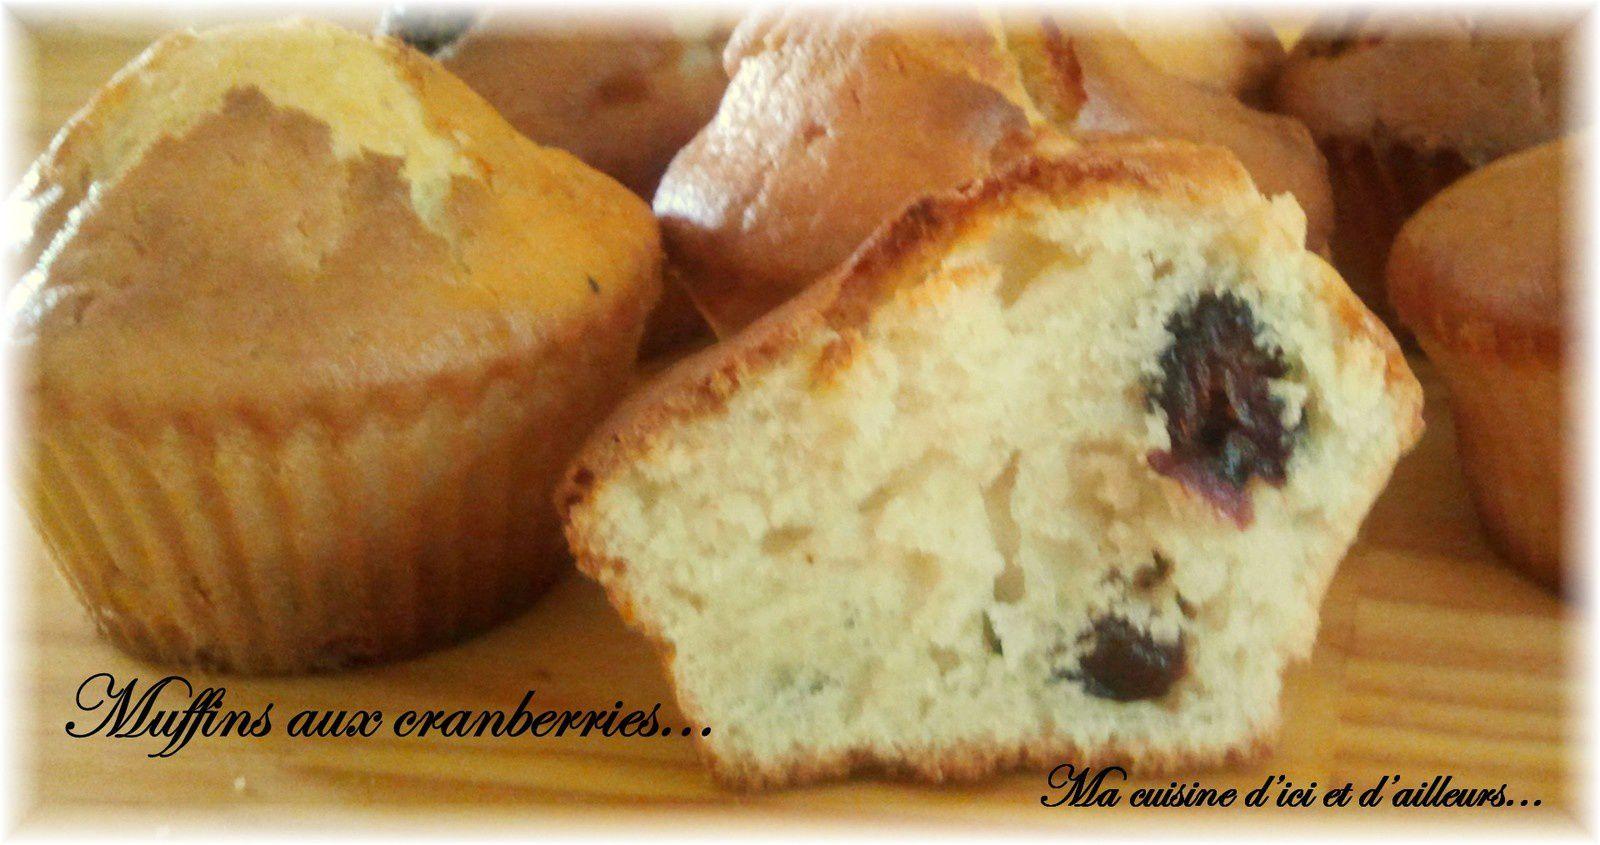 Muffins aux cranberries...